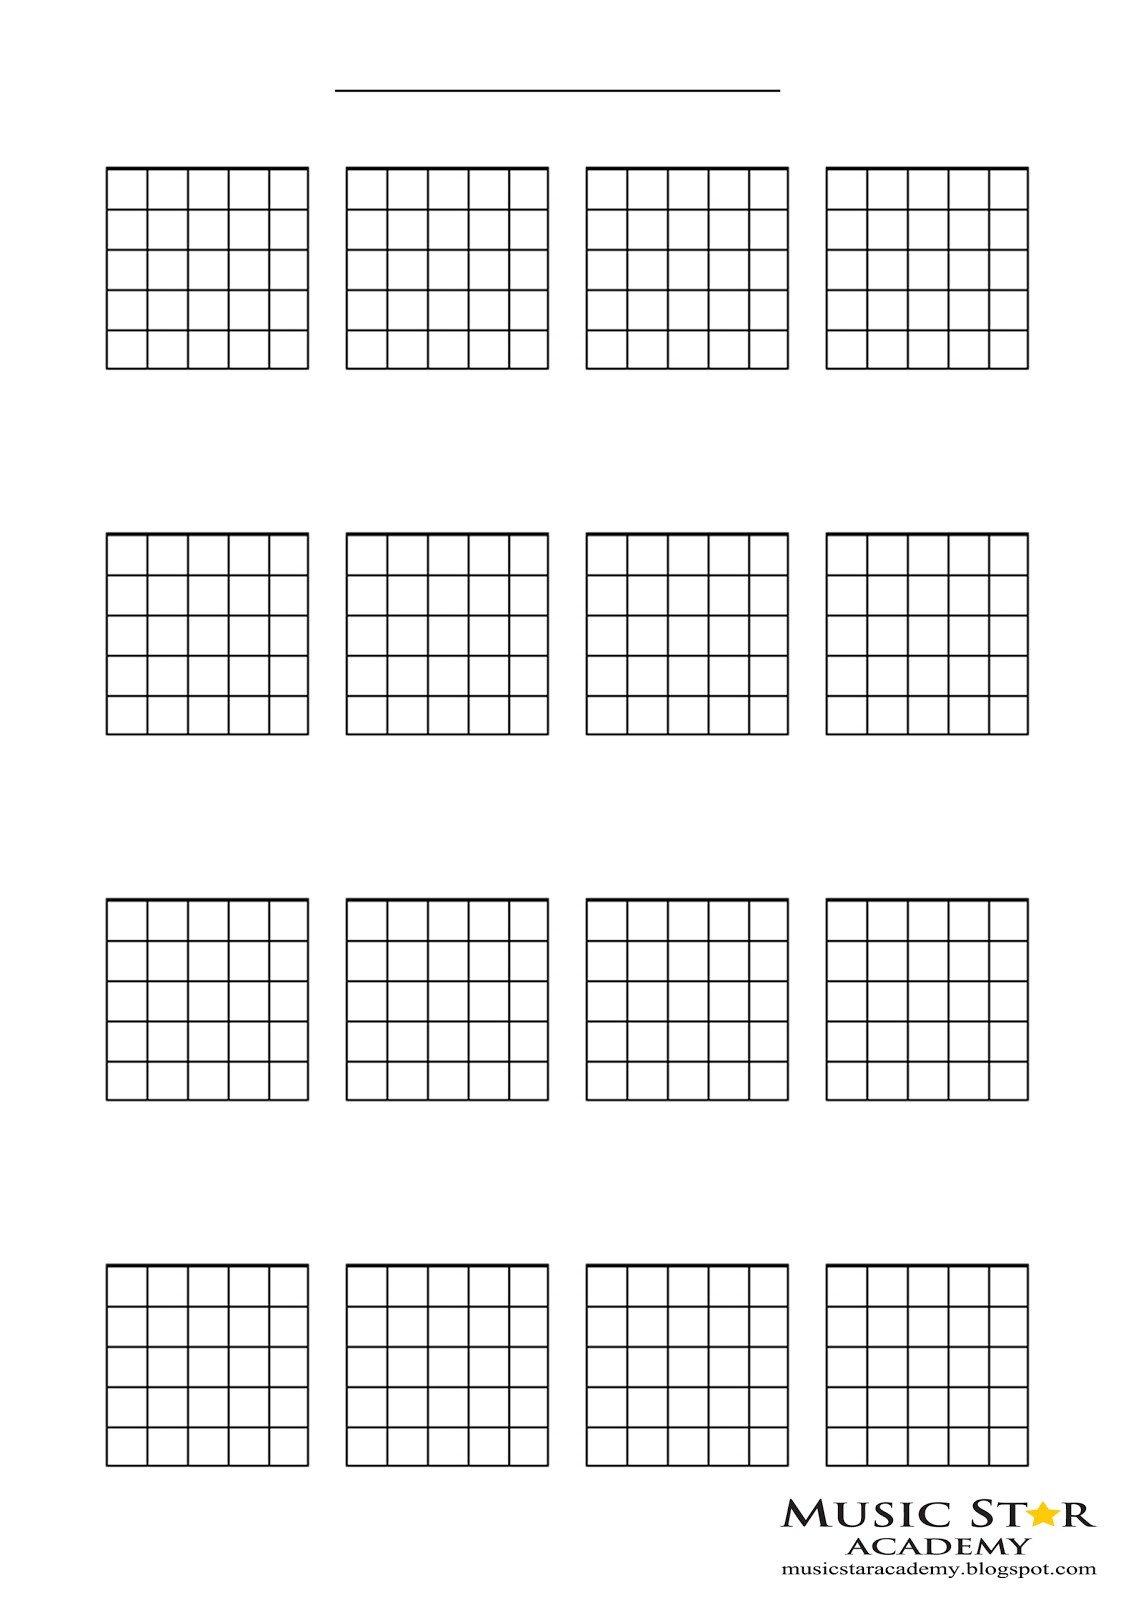 Blank Guitar Chord Chart Music Star Academy Free Downloads